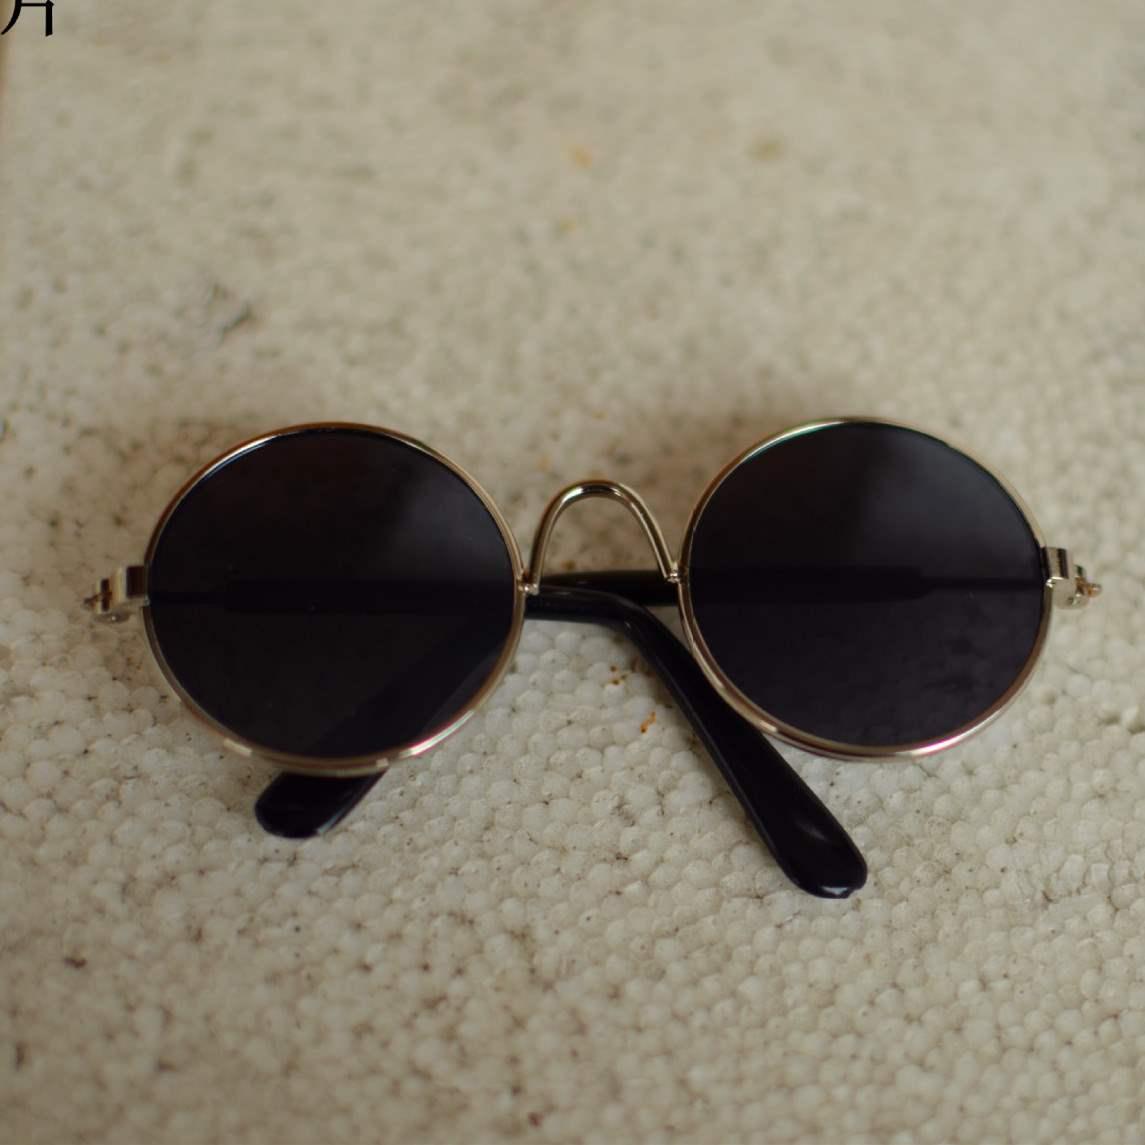 Pet master round small glasses decoration props Sunglasses small dog glasses cat glasses dog